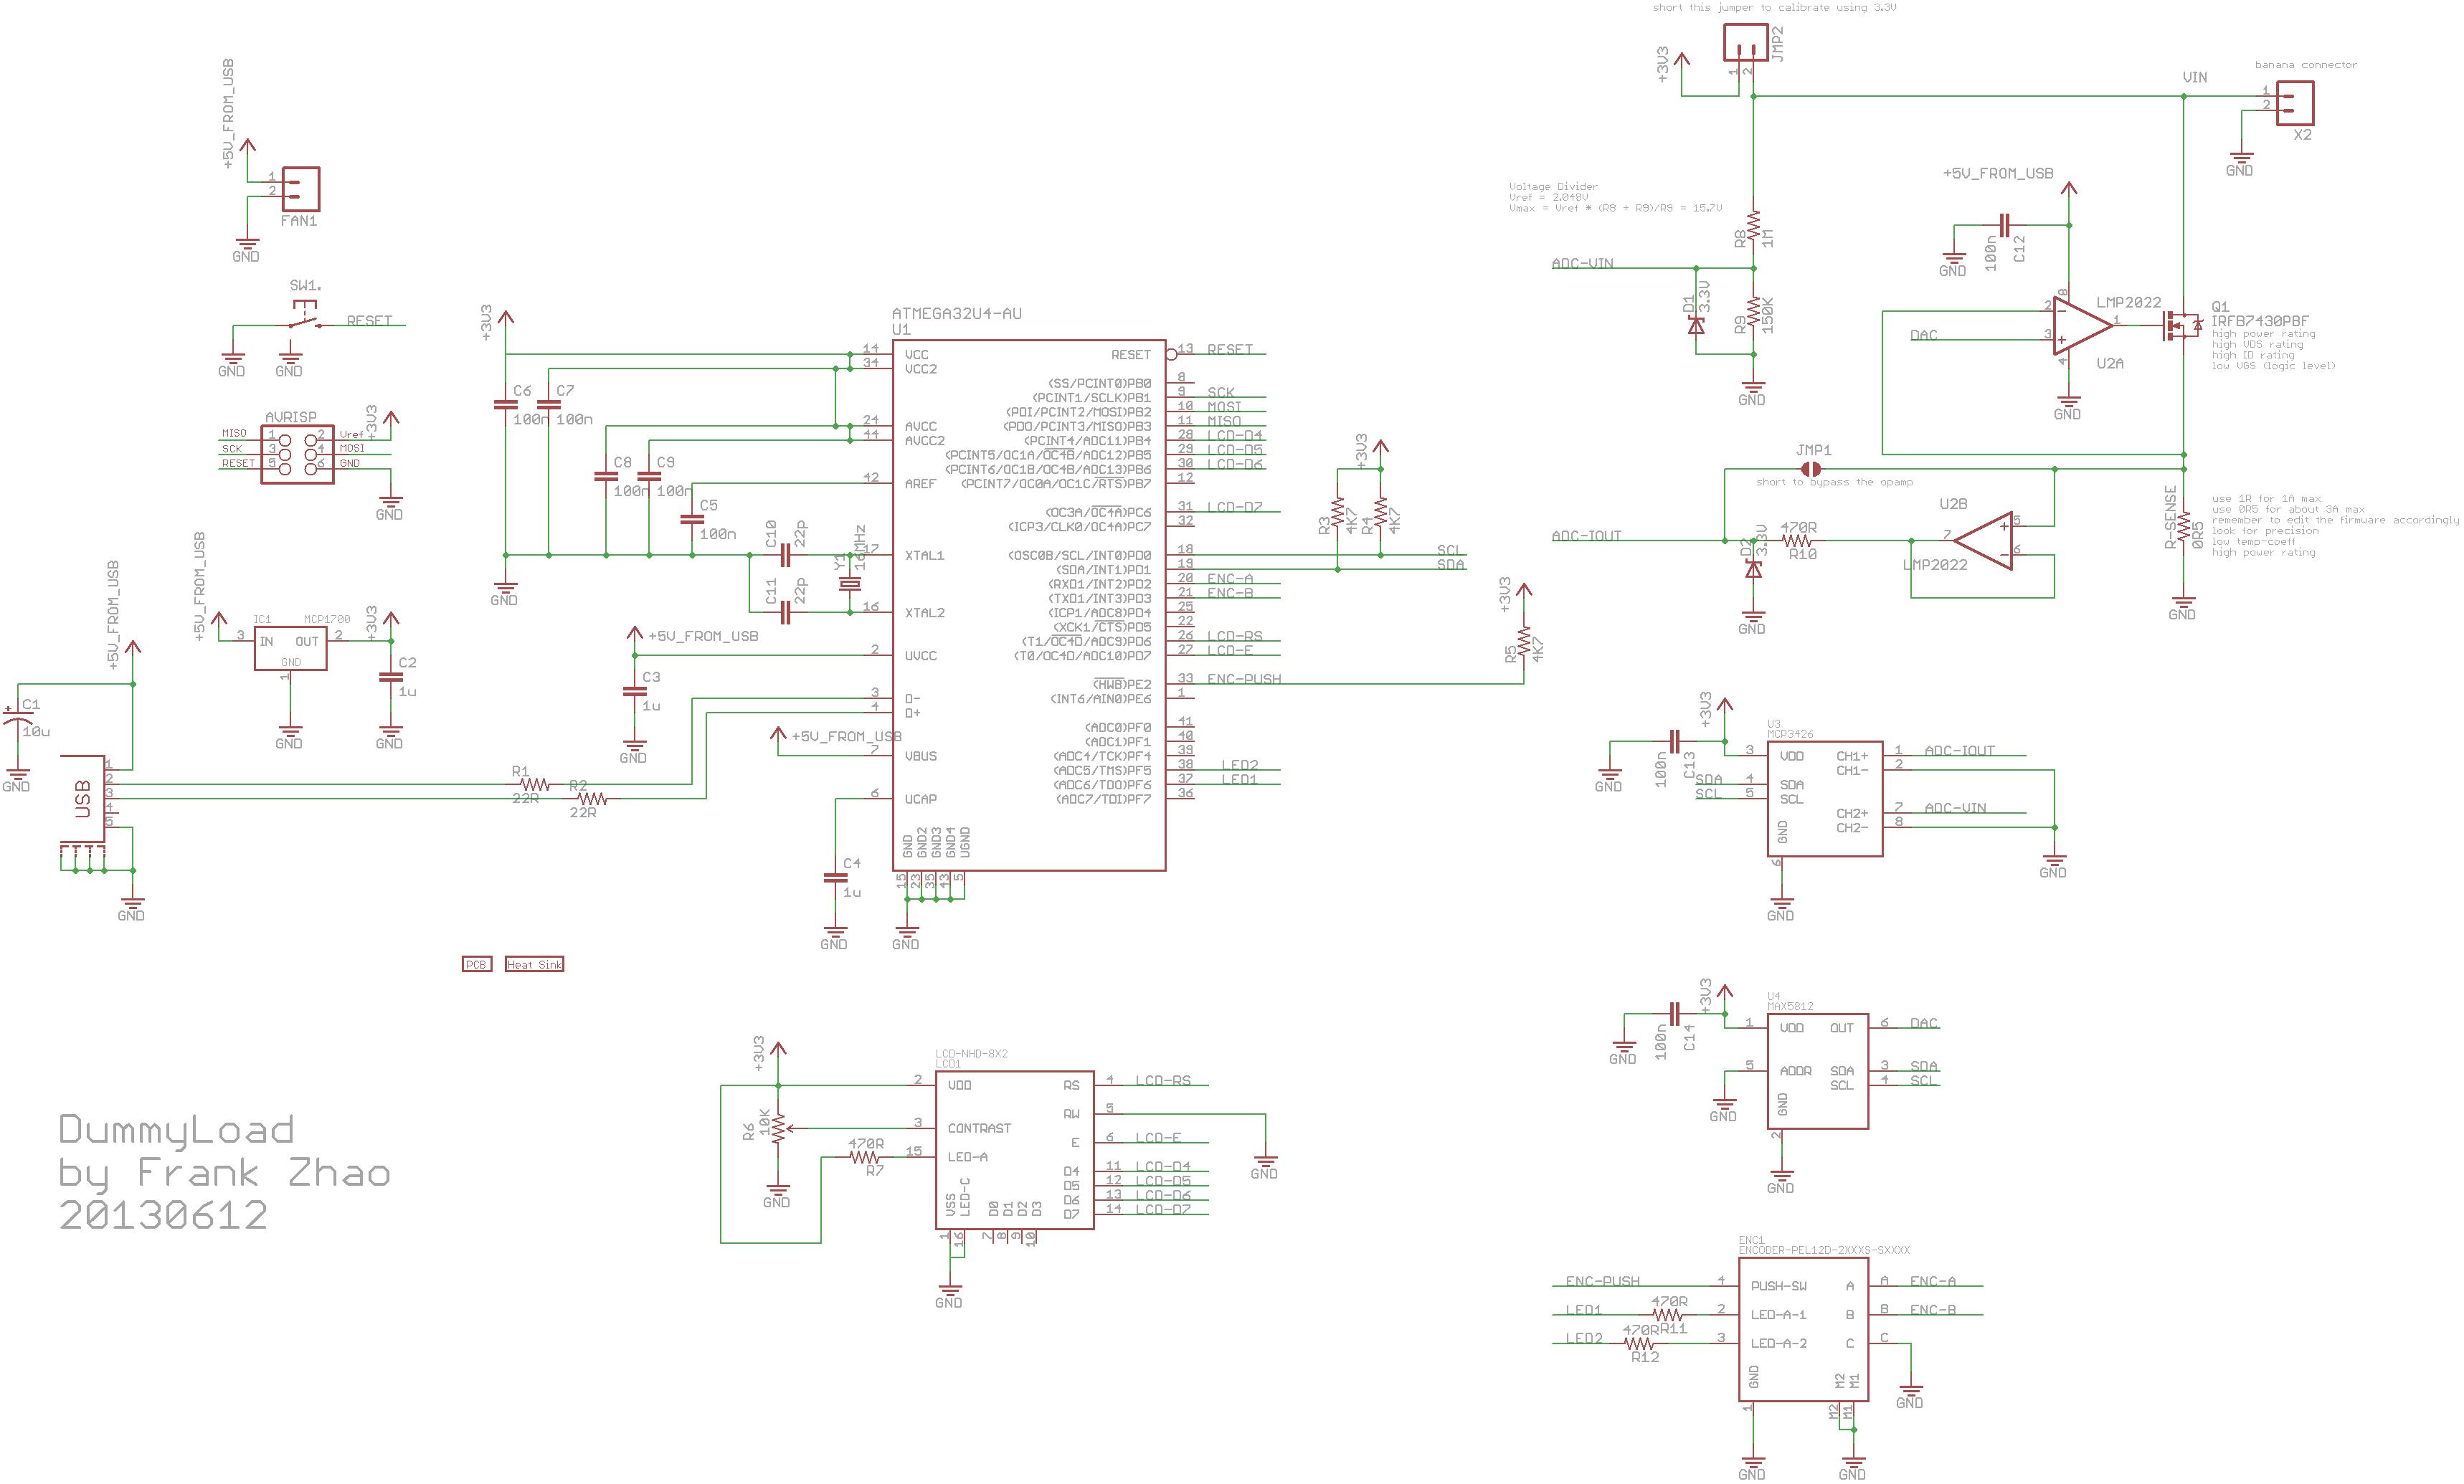 dc dummy load circuit calibration